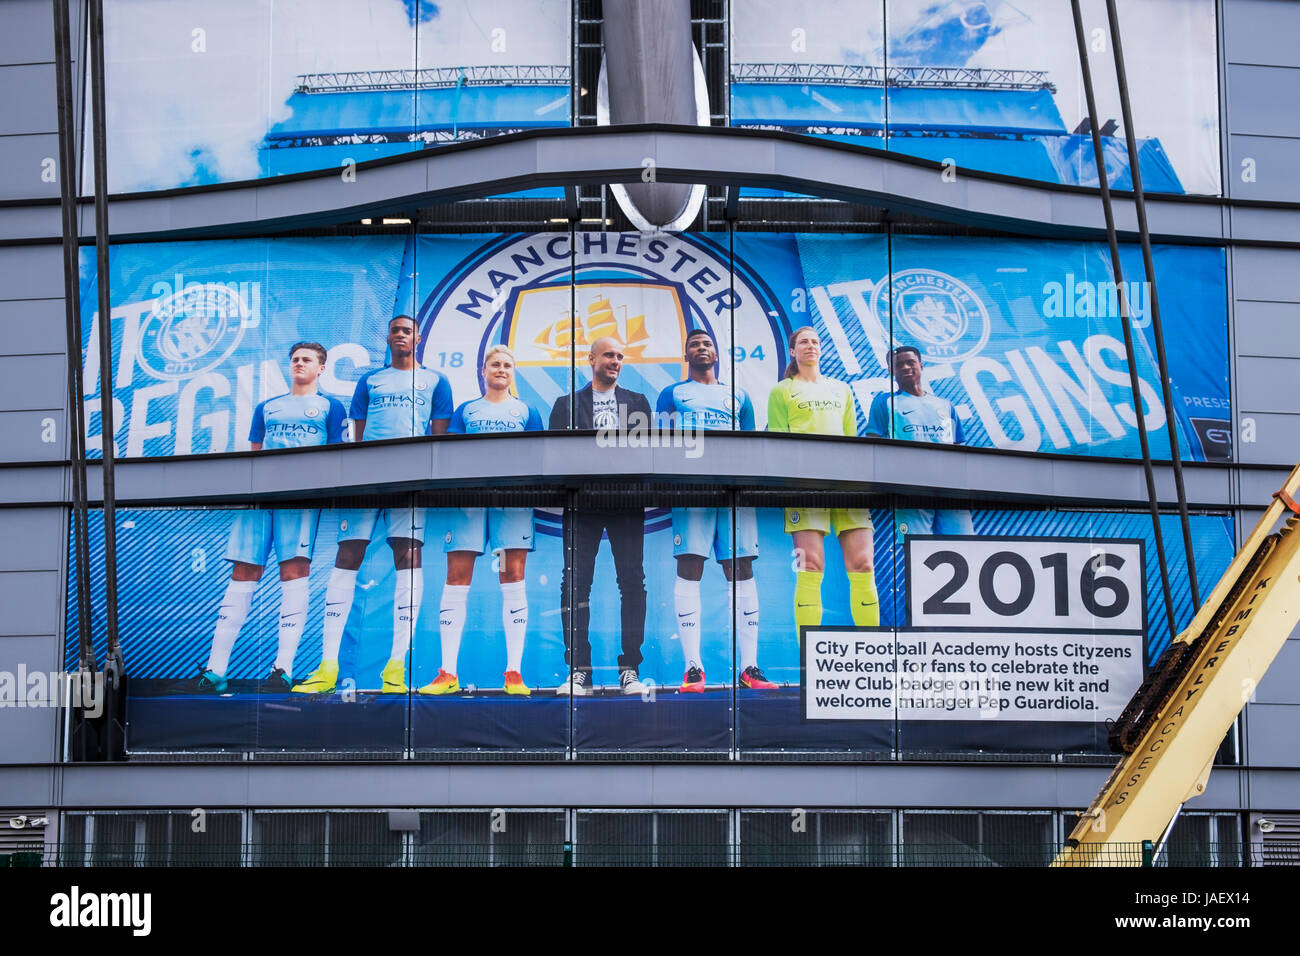 Etihad Stadium home to Manchester City football club, Manchester, England, U.K. - Stock Image